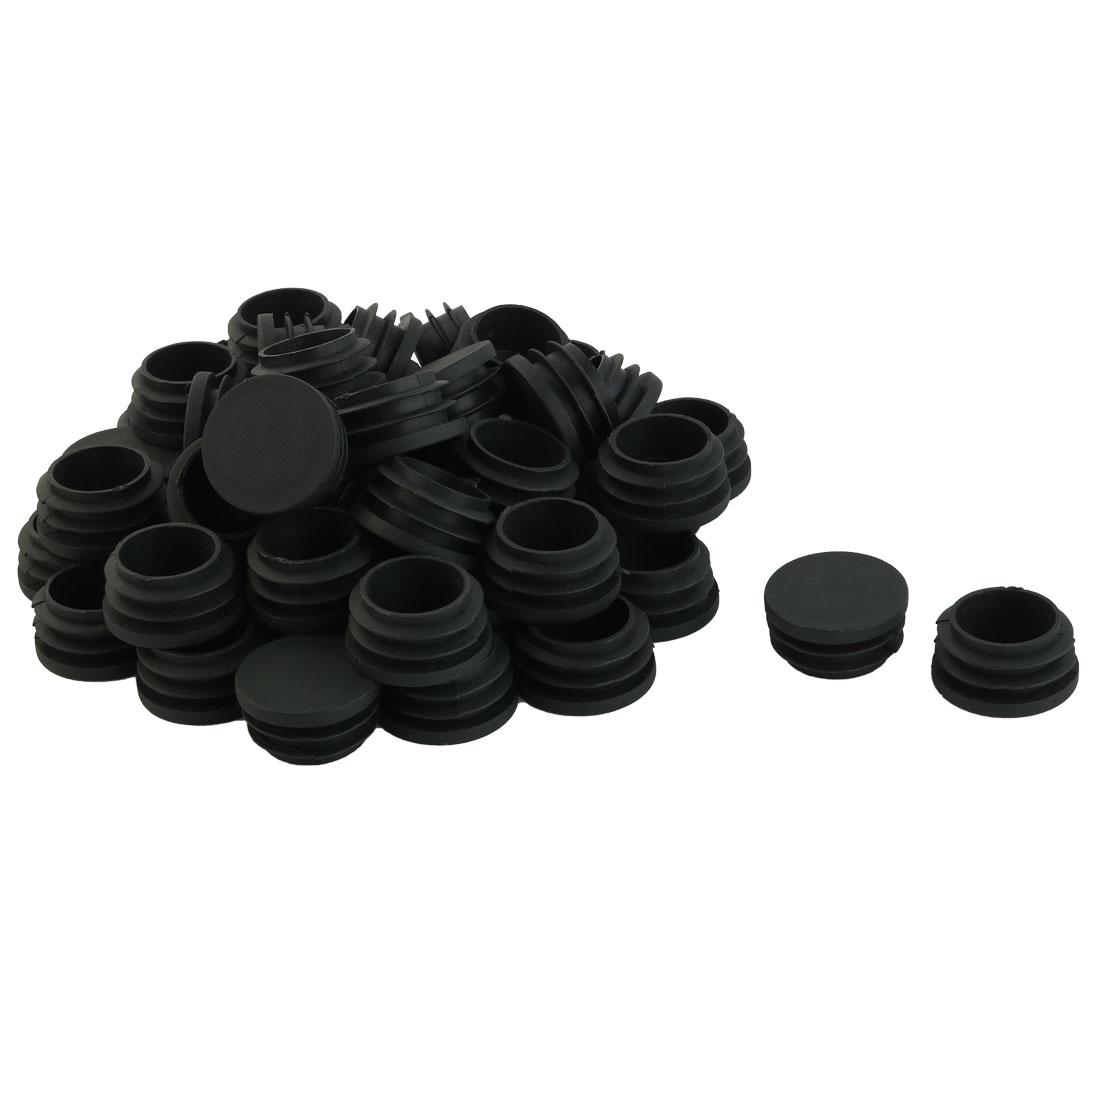 Furniture Table Chair Legs Plastic Flat Base Round Tube Pipe Insert Cap Cover Black 25mm Dia 50pcs